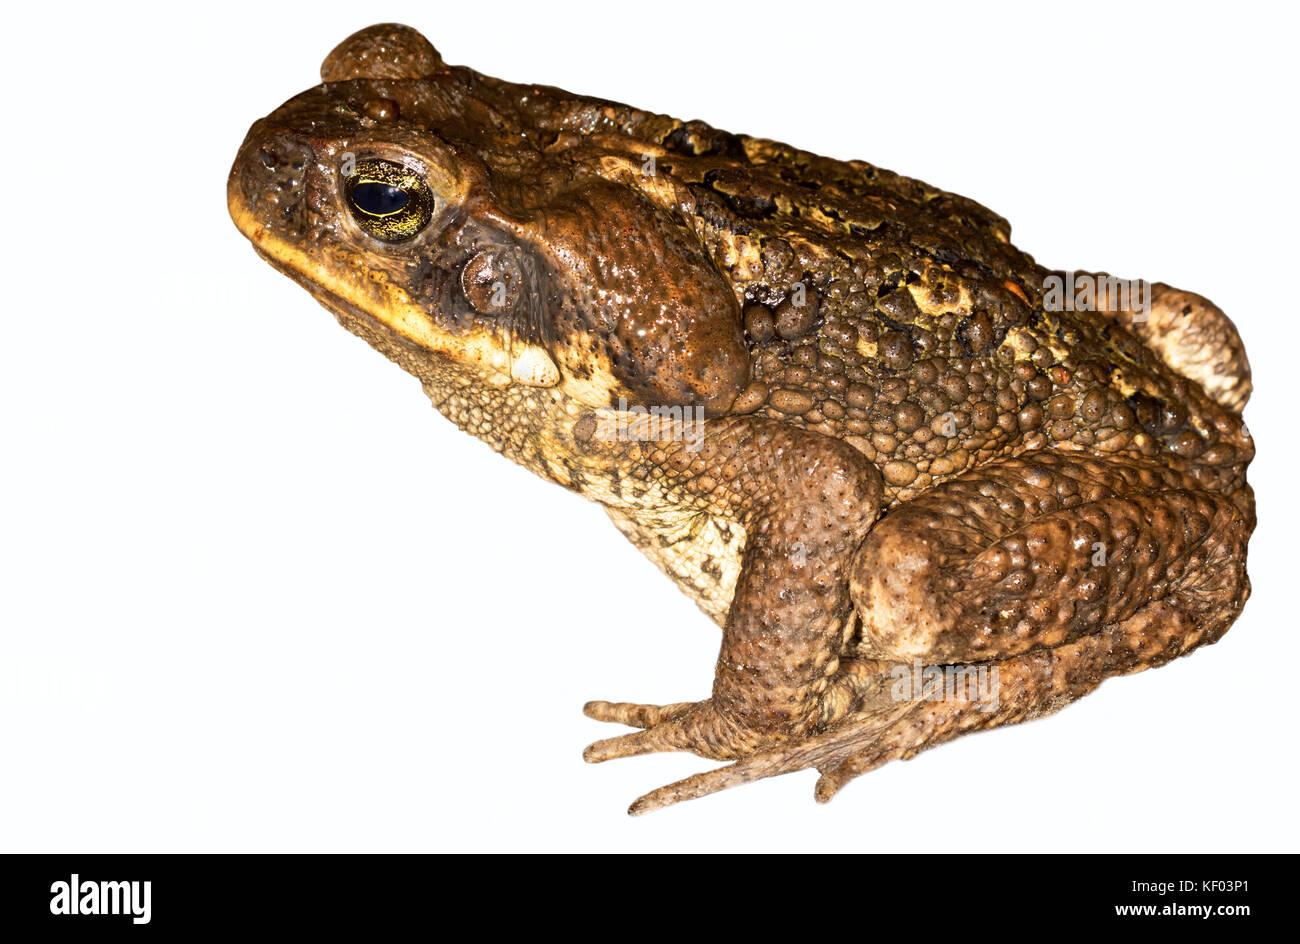 Cane toad, Amazon jungles of Peru - Stock Image